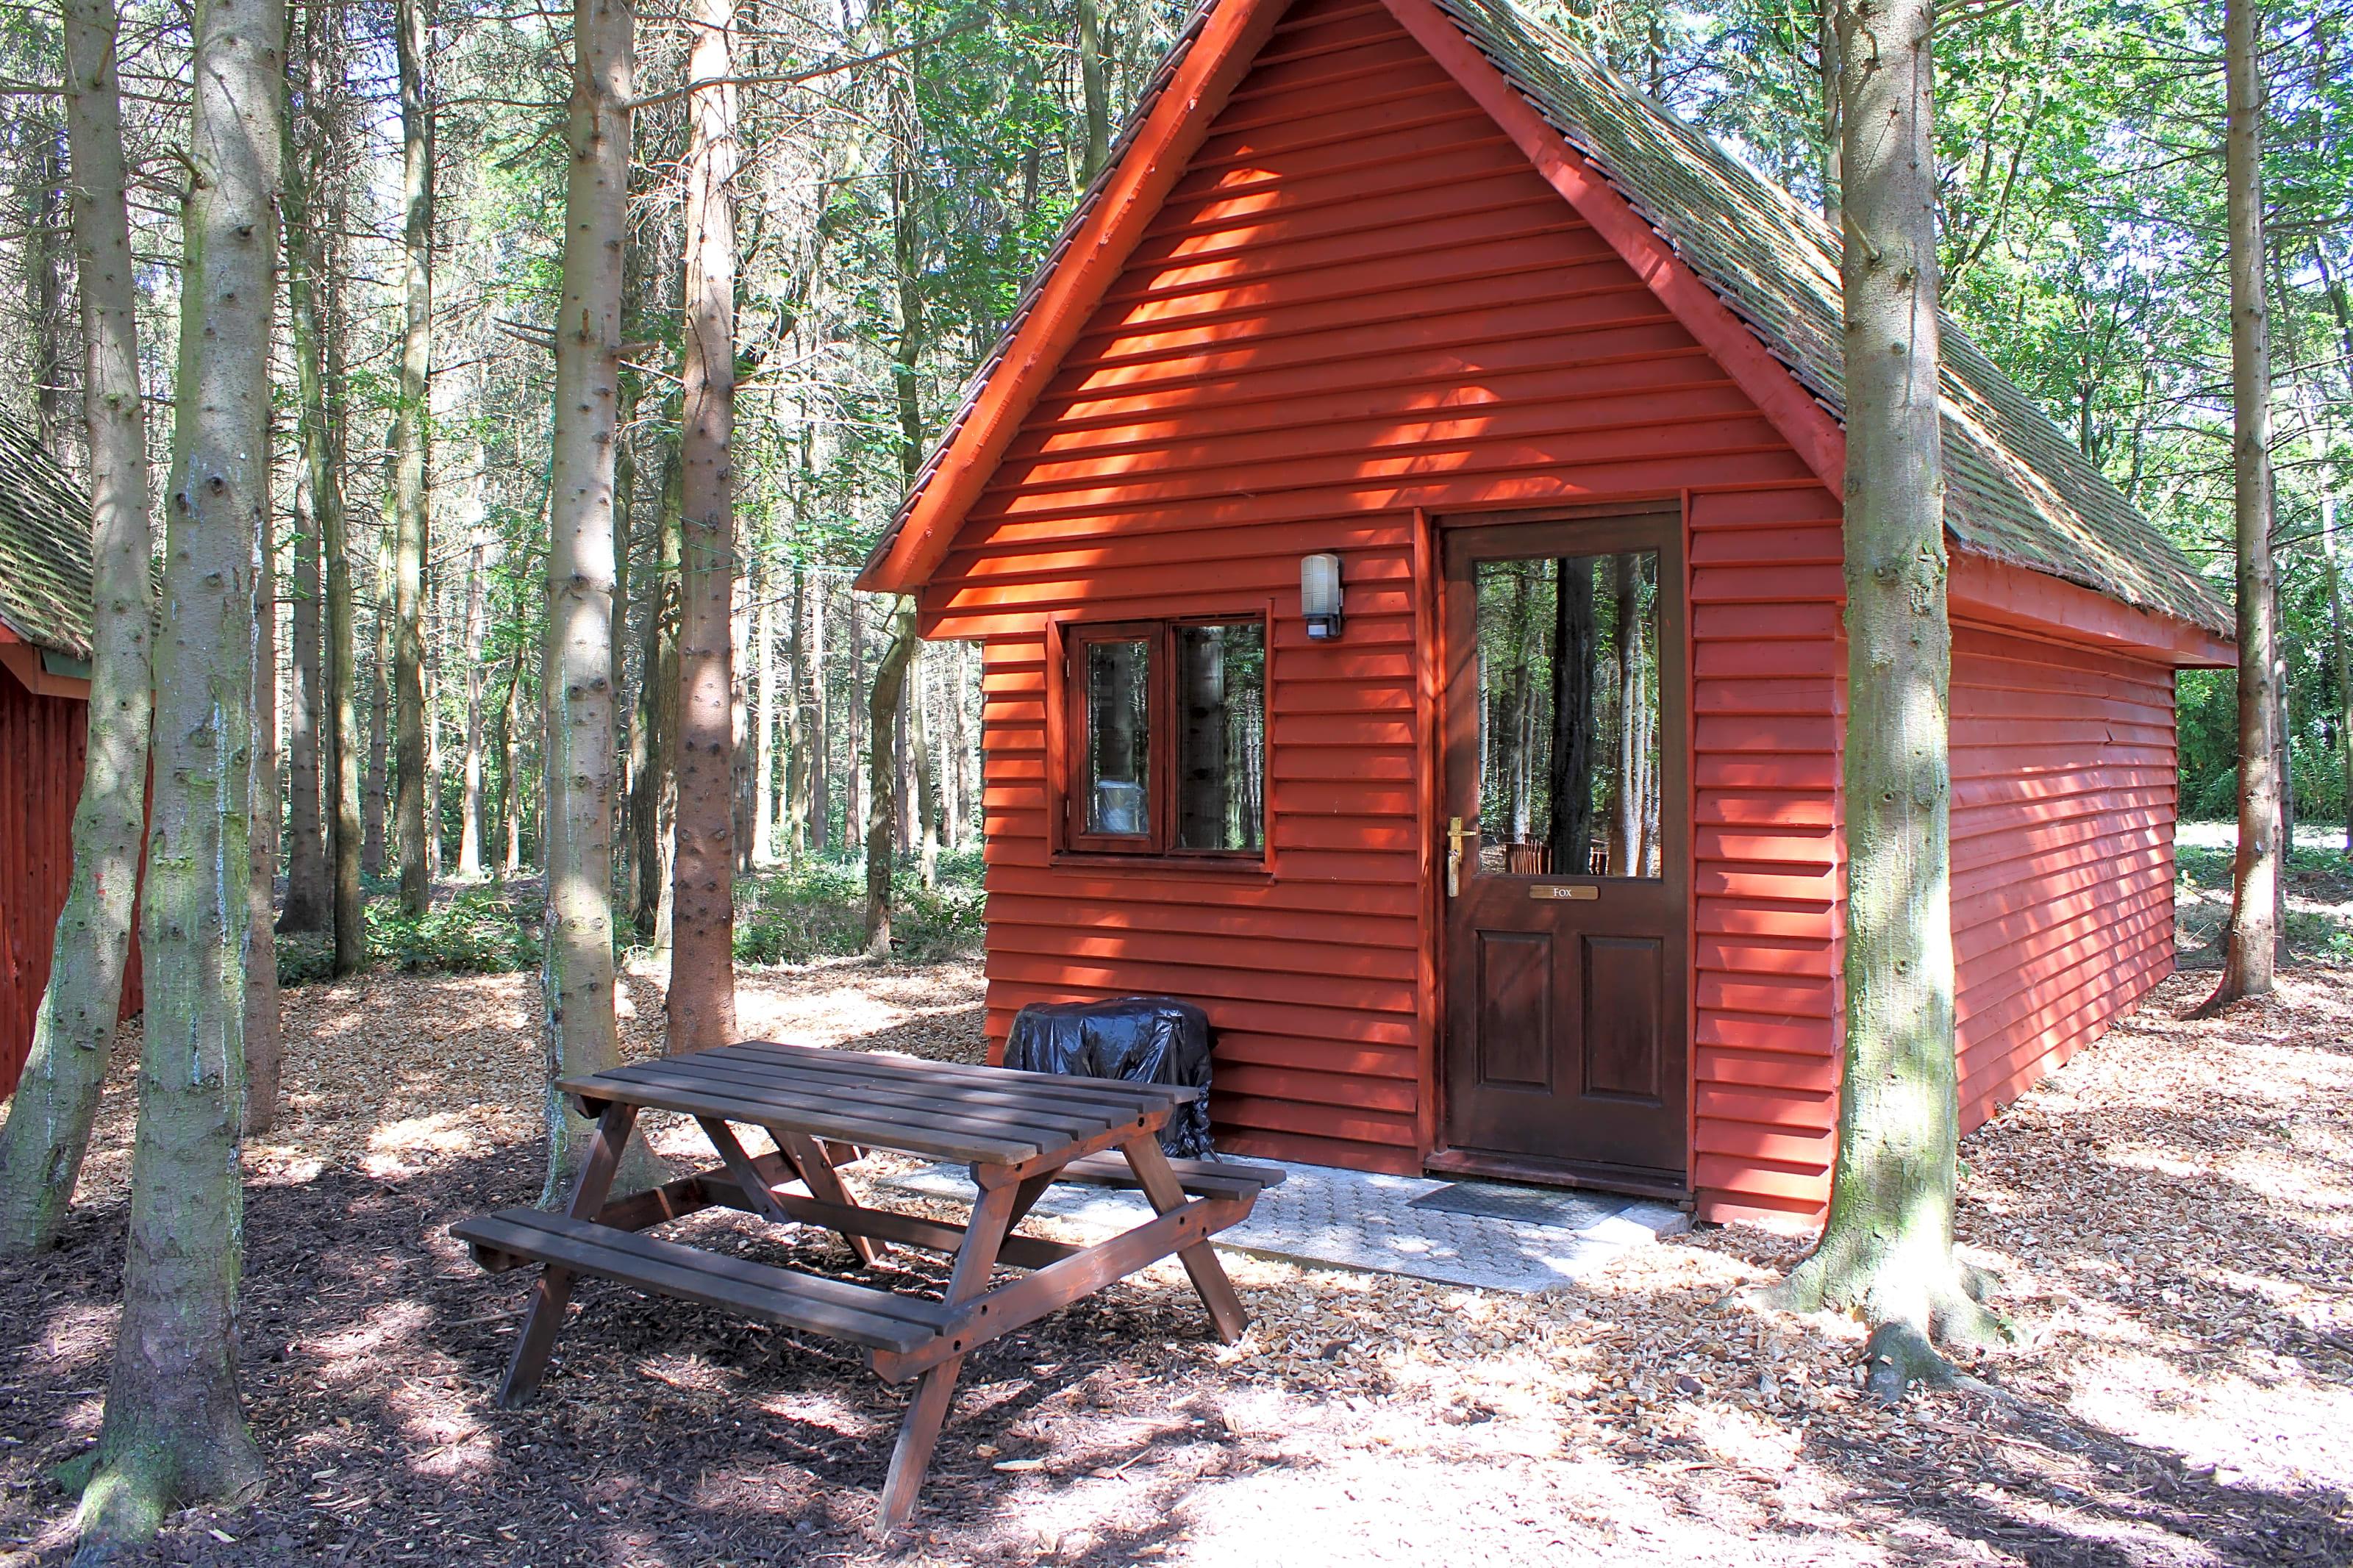 Nantclimbers Woodland Camping Huts, Ellesmere - Updated ...